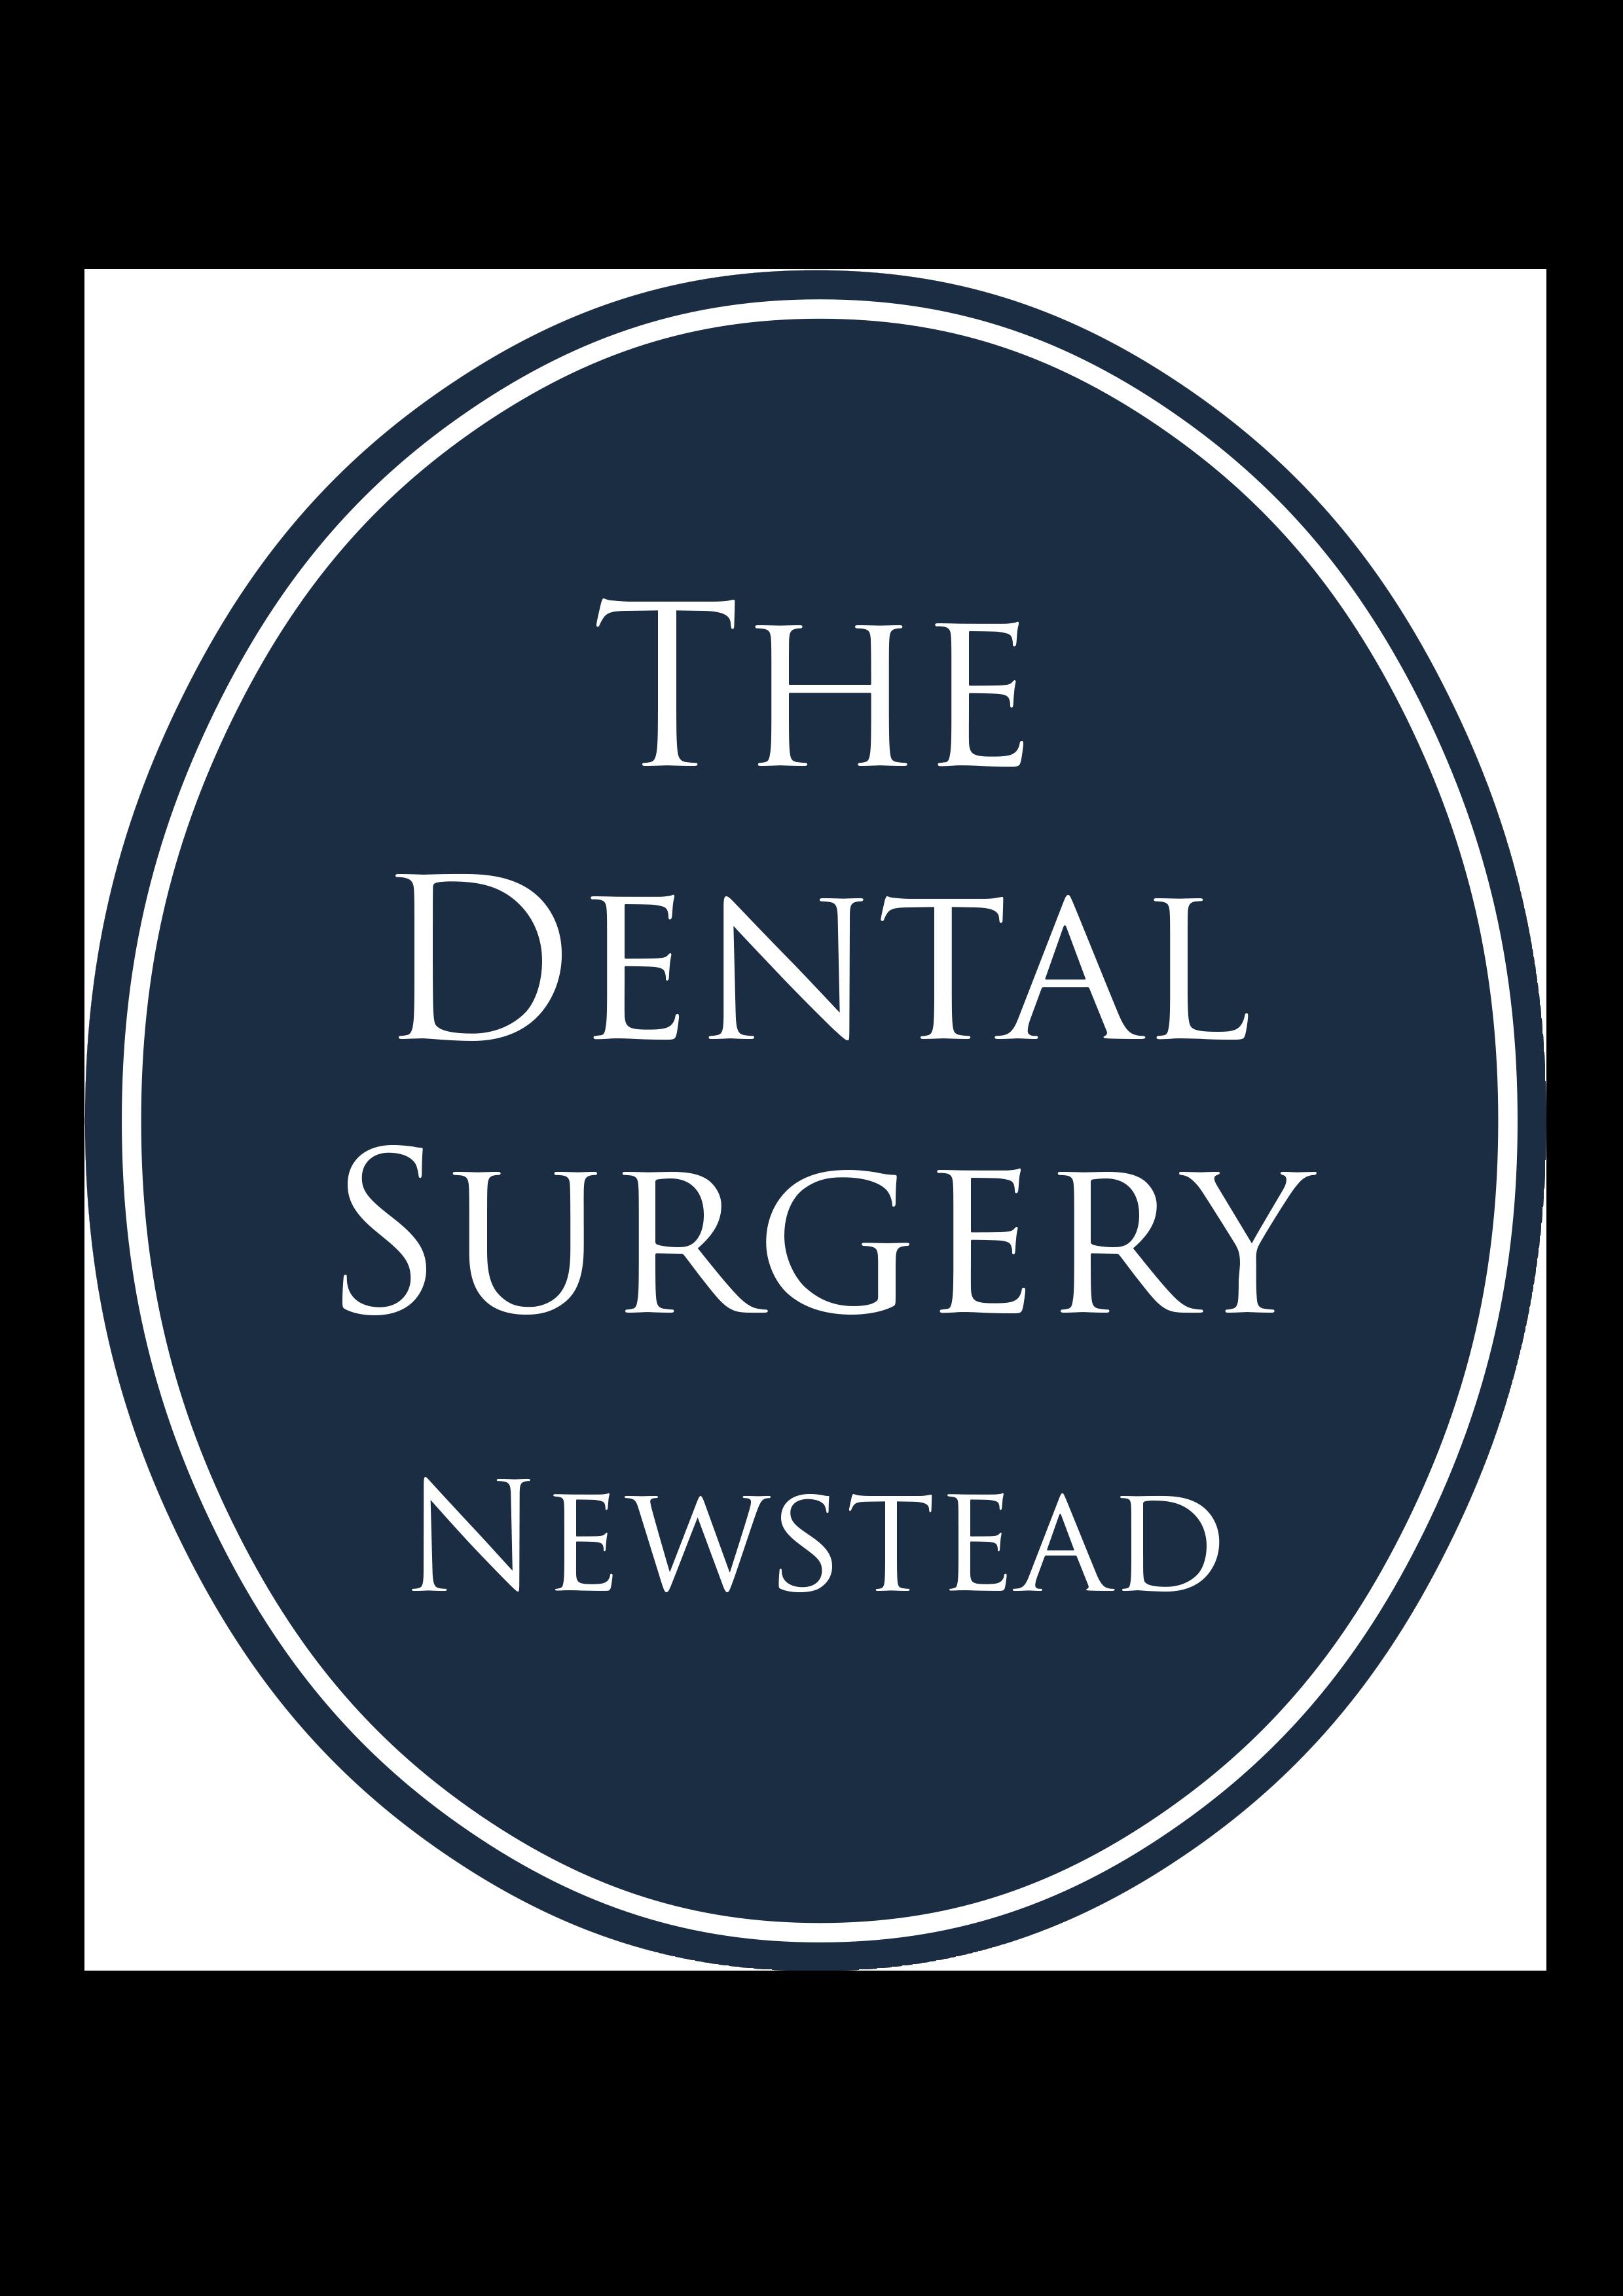 The Dental Surgery Newstead